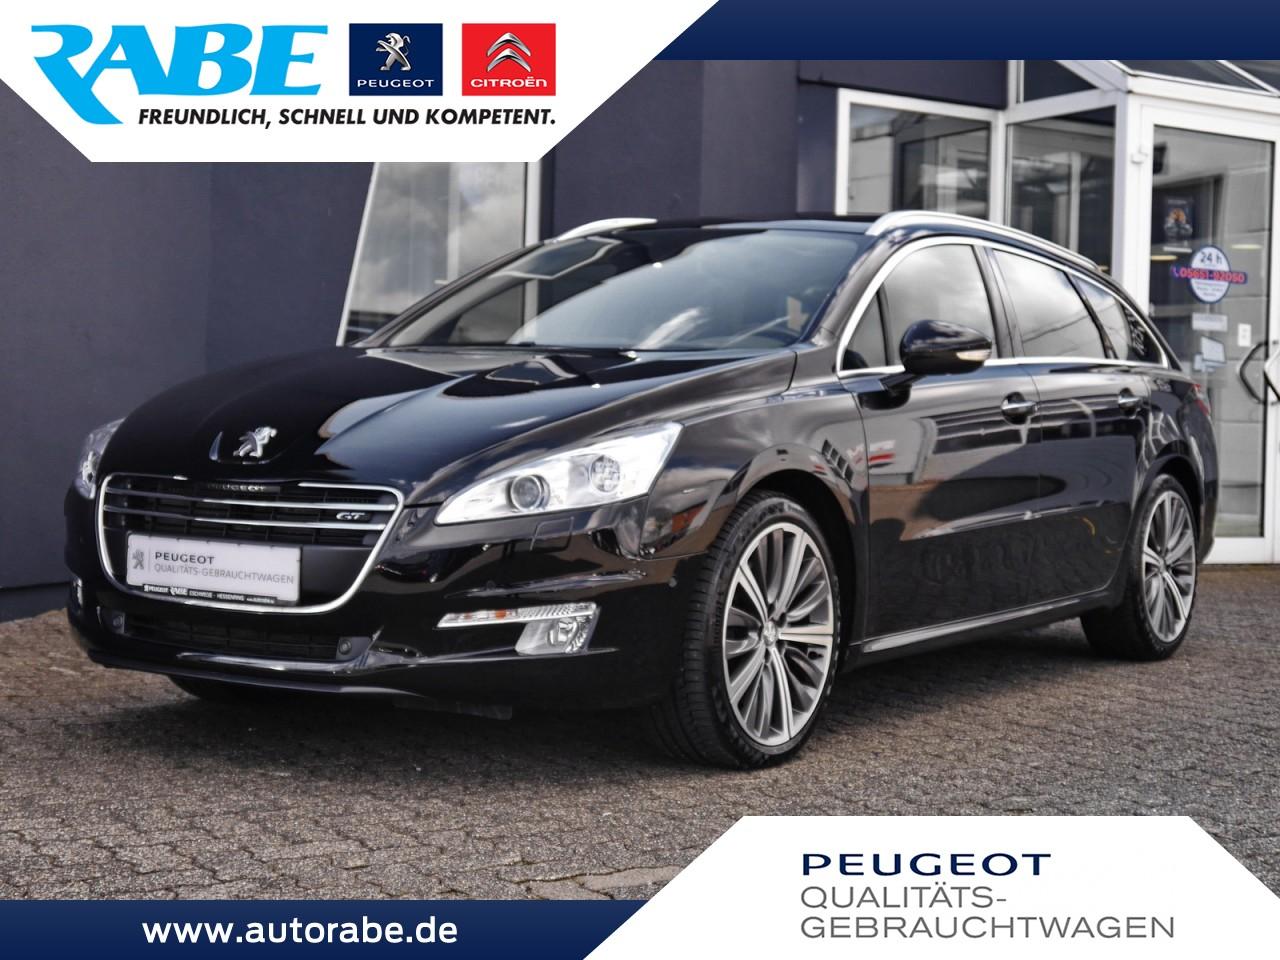 Peugeot 508 SW GT 205 HDi Xenon+Pano+NAV+Kamera+E-Heckkl, Jahr 2014, Diesel